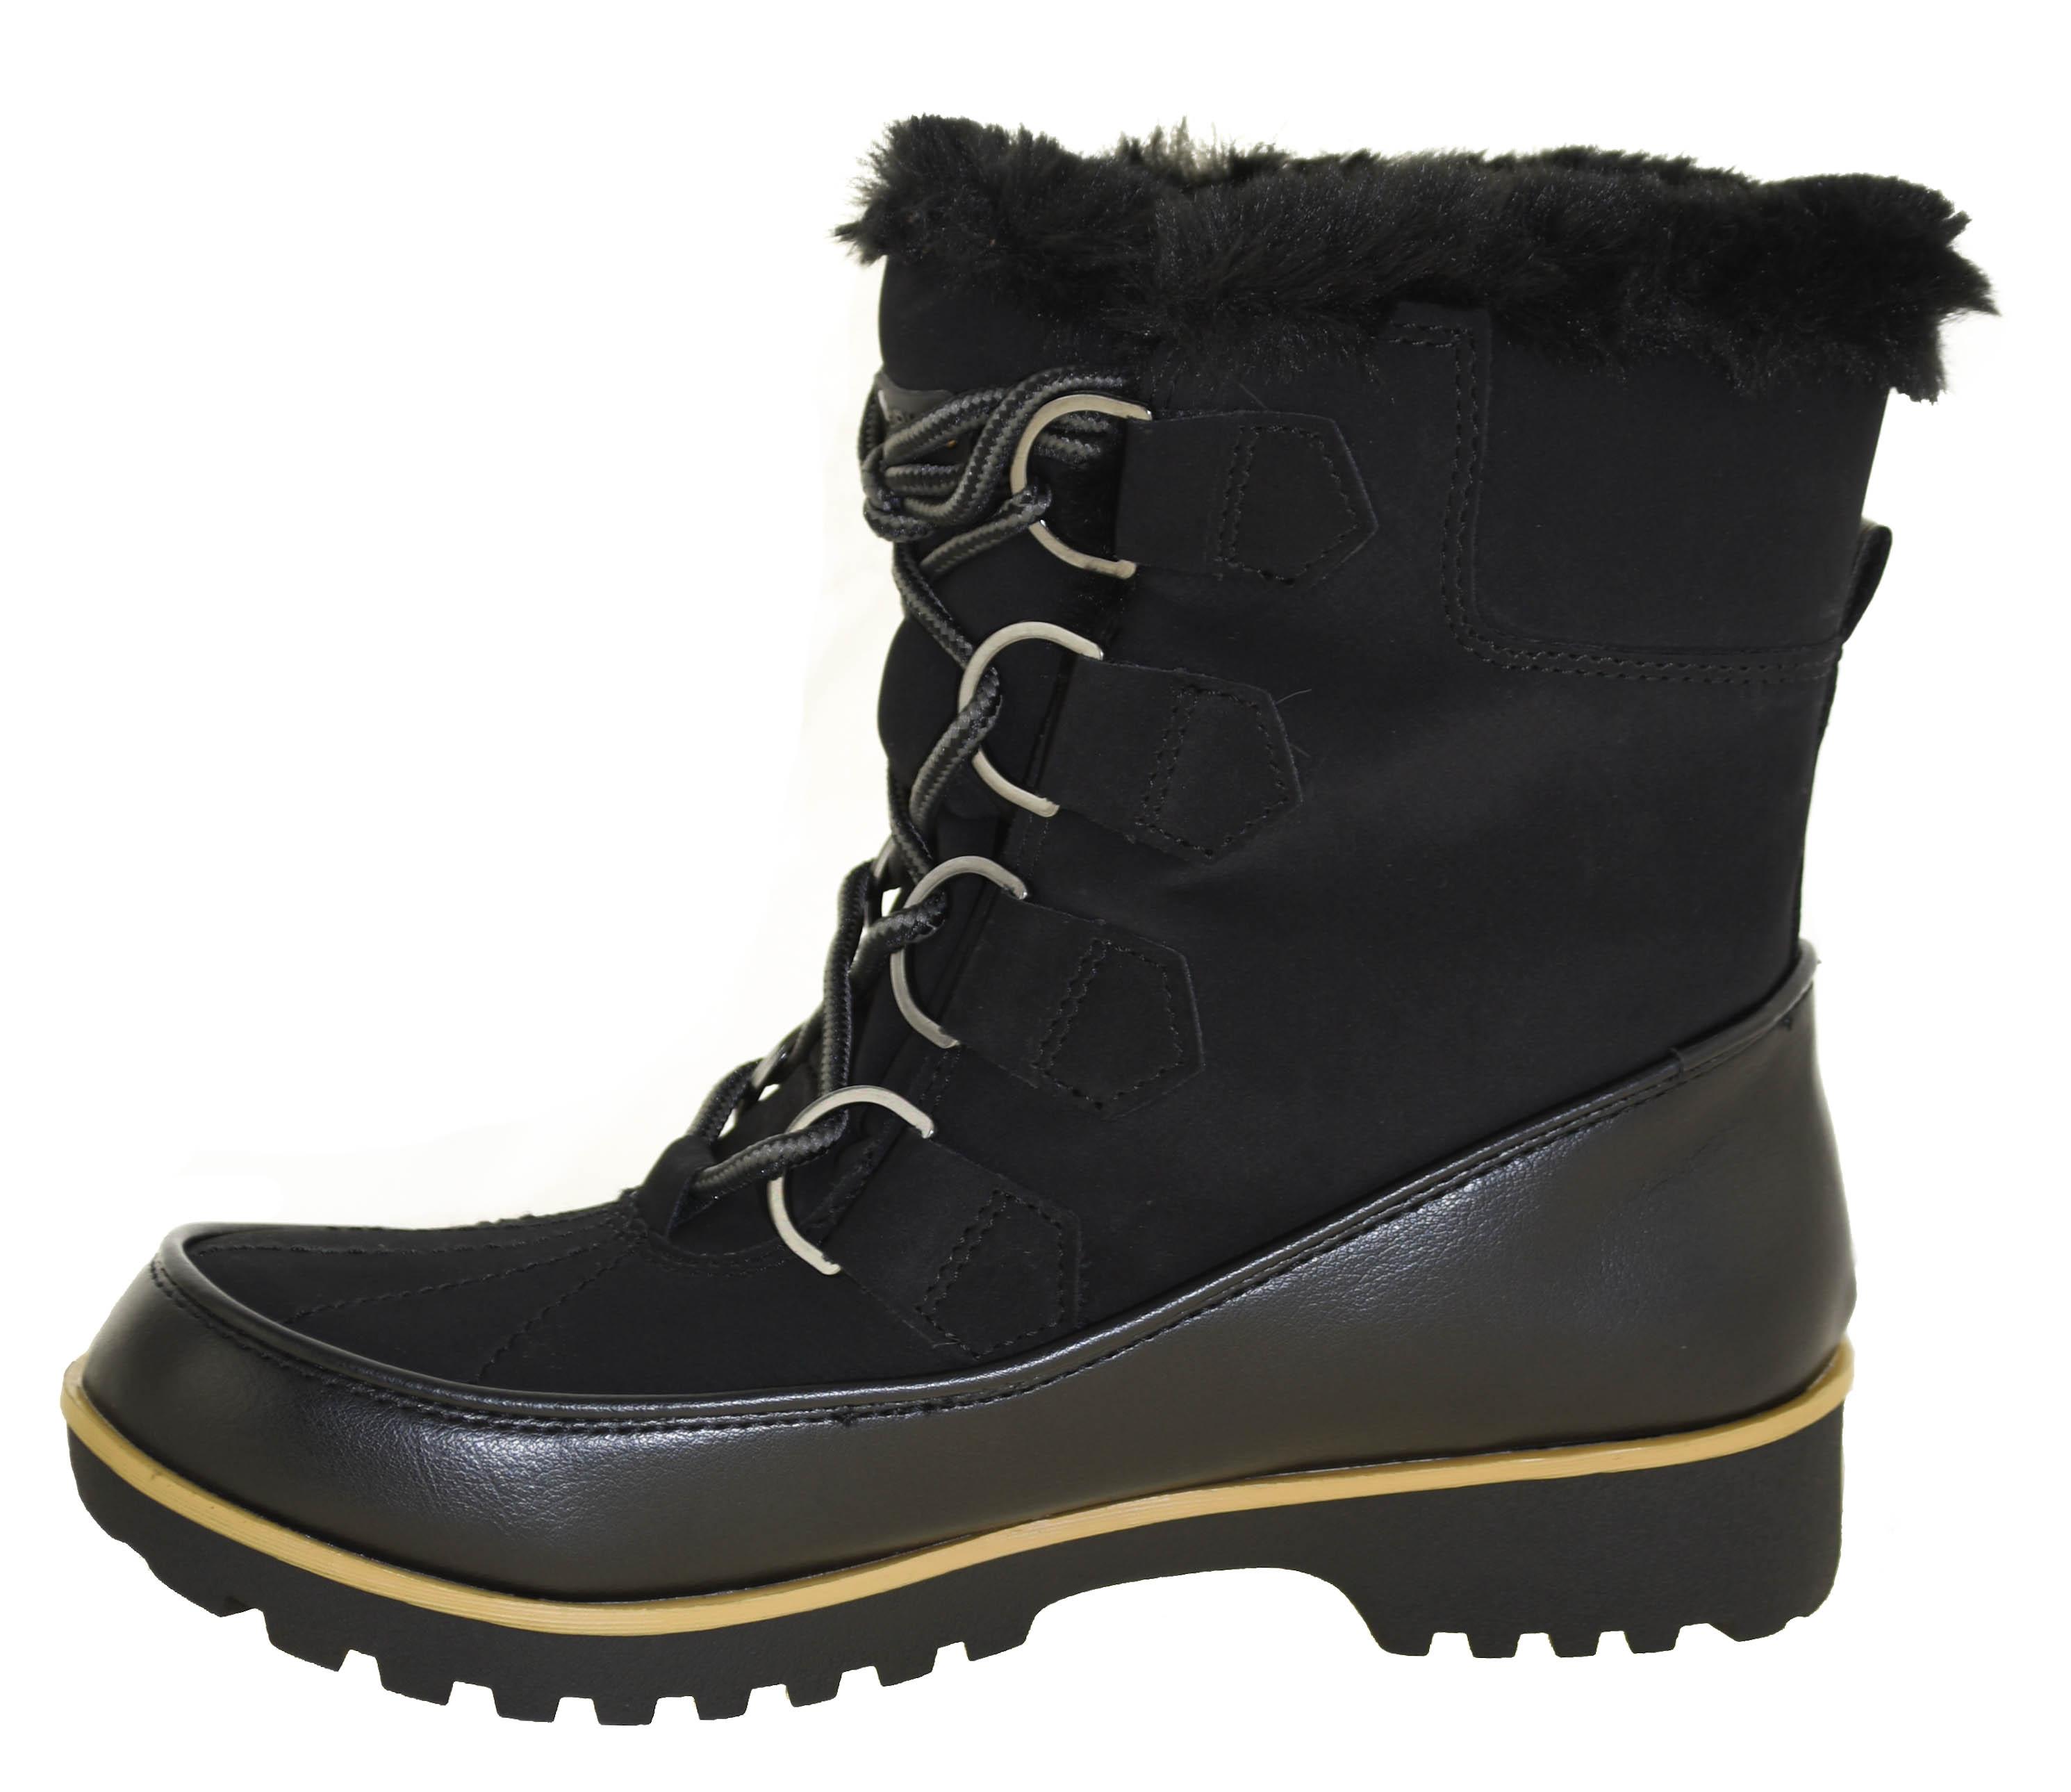 f08b255c2bb JBU by Jambu Women s Manchester Winter Boots Black